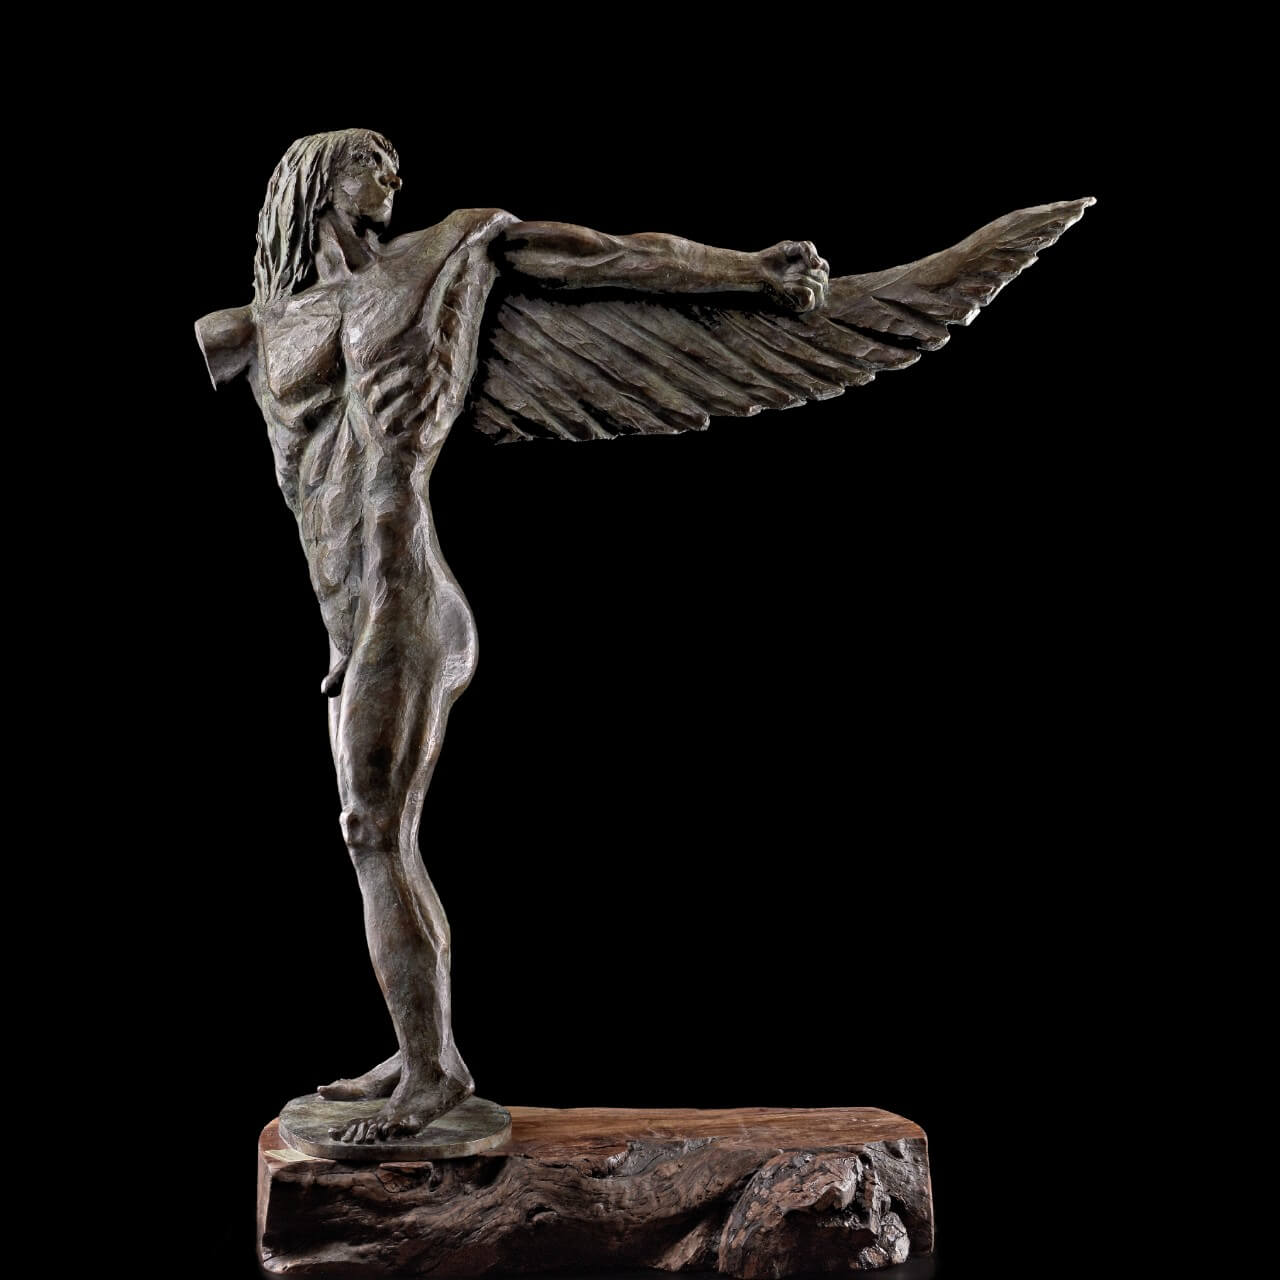 scultura bronzo Mario Pavesi artista reggiano arte icaro corpo maschile